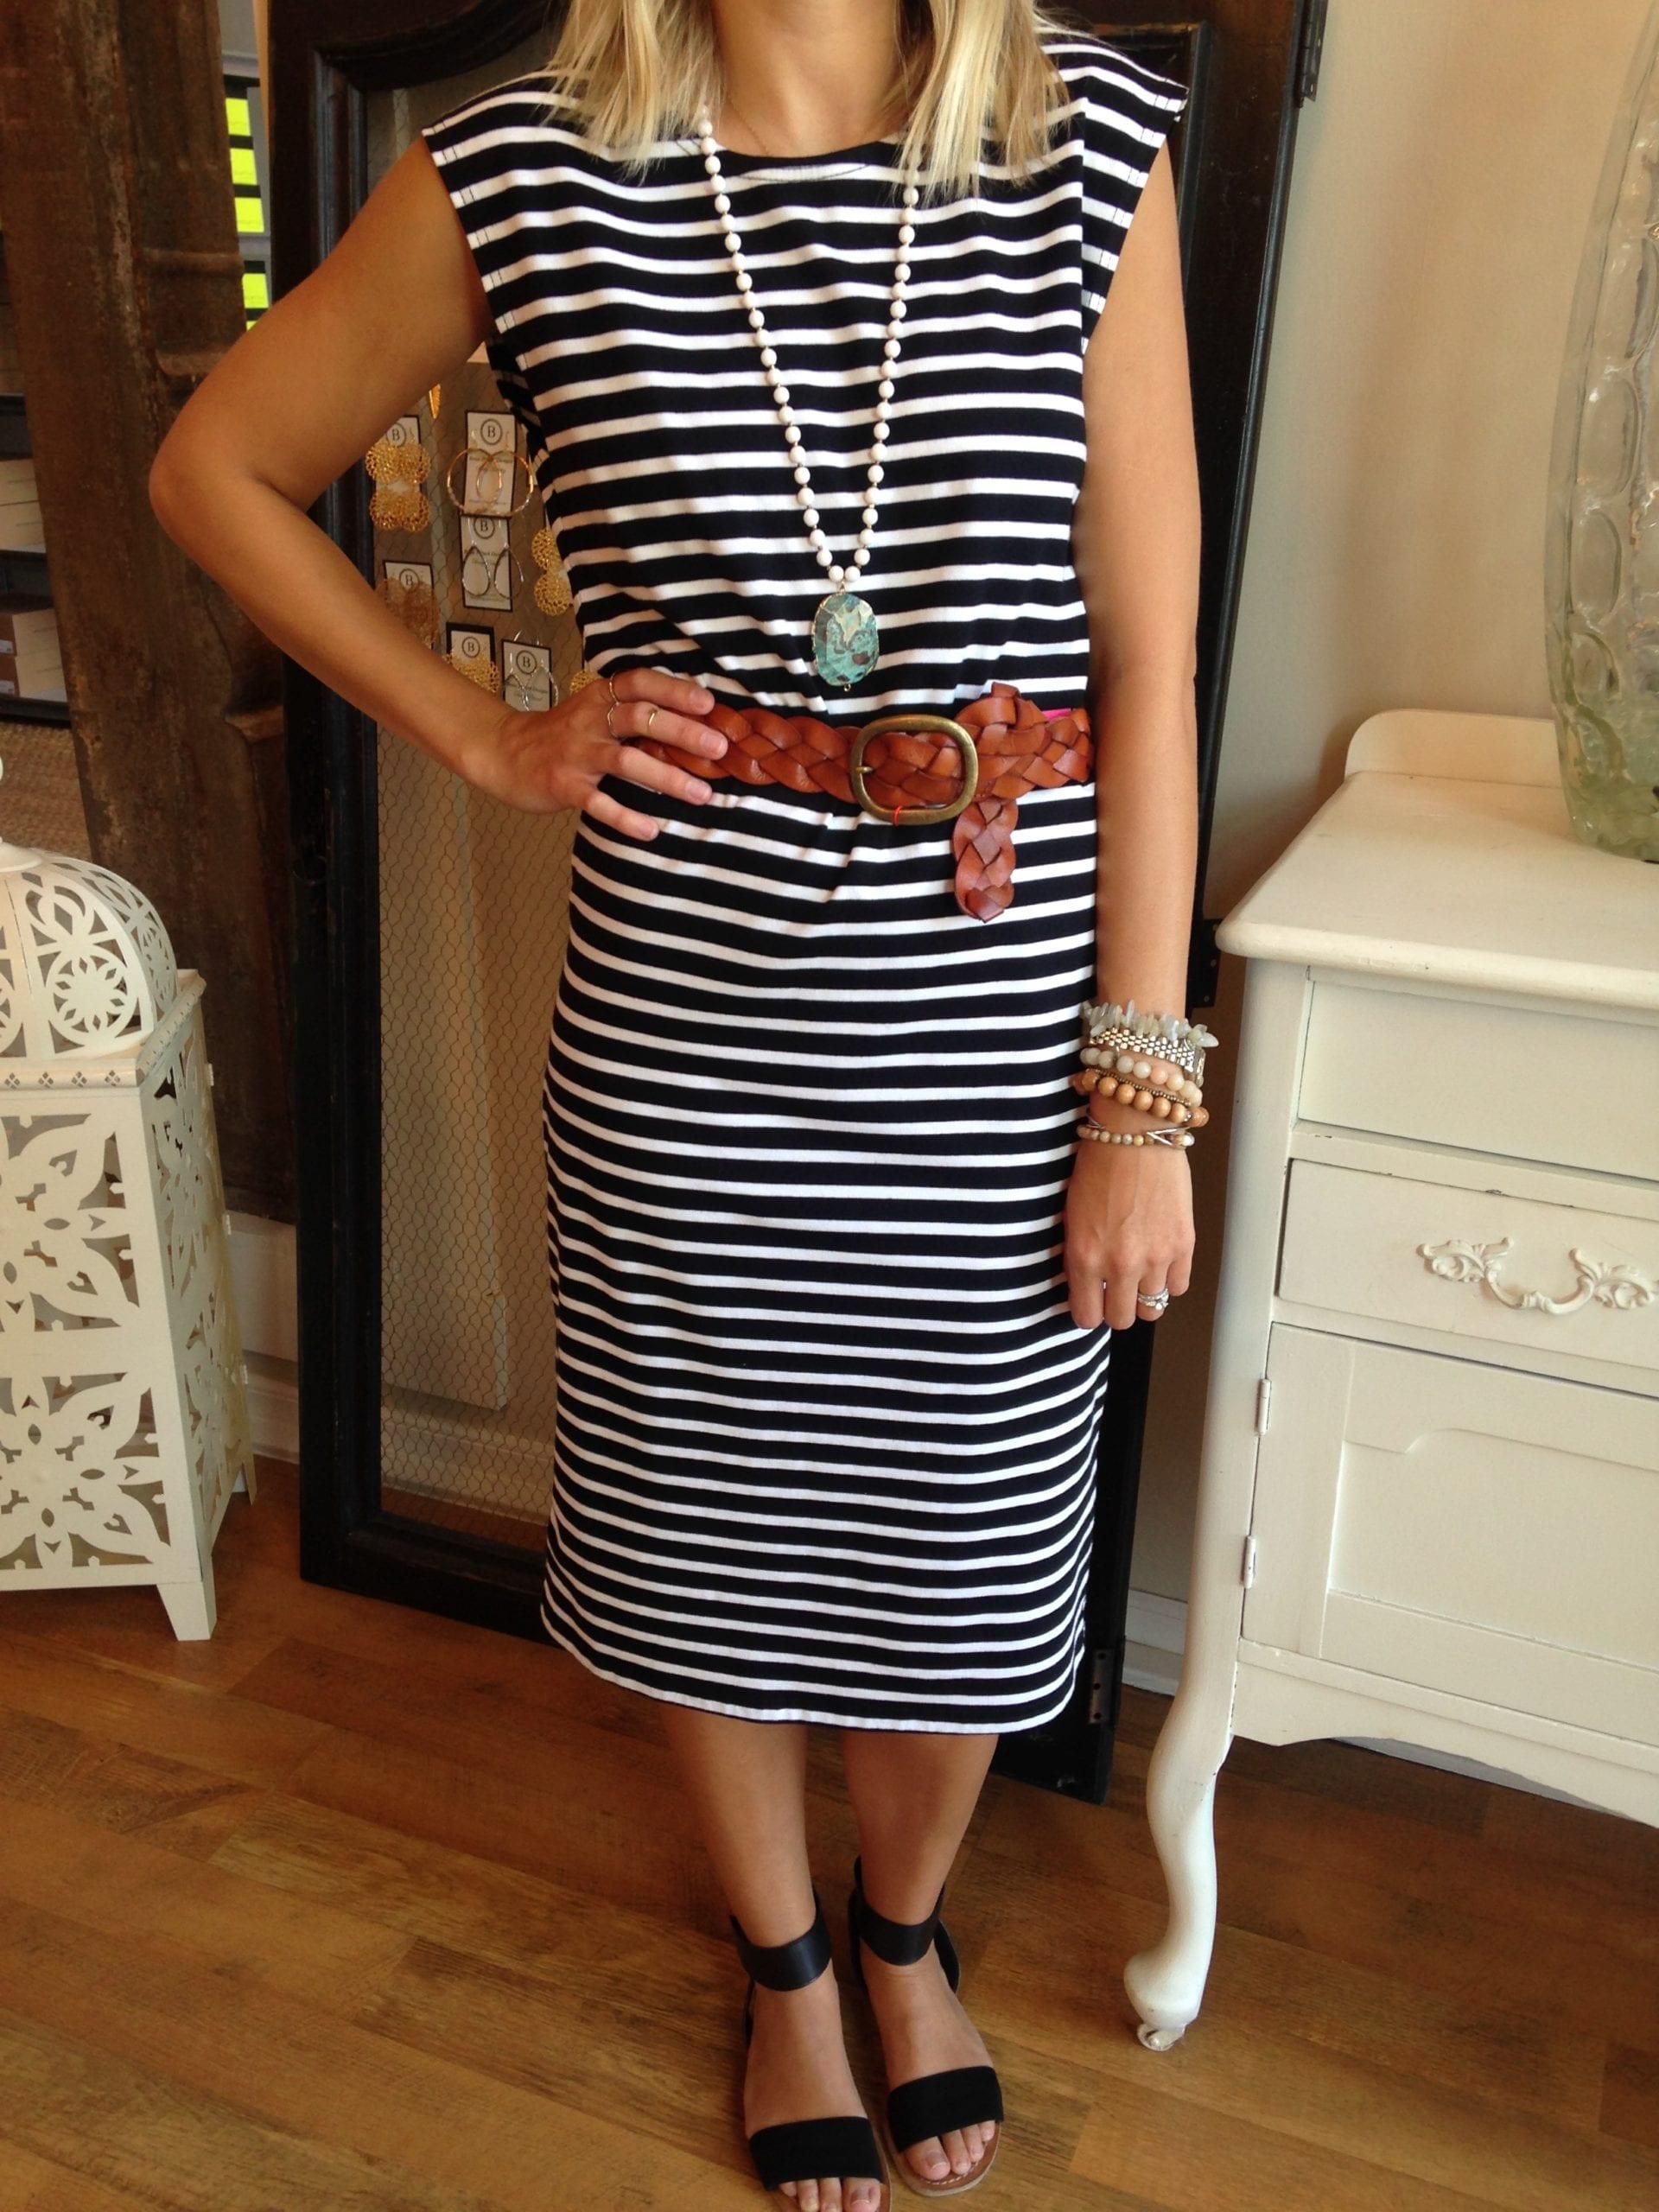 2 Ways To Style A Maternity Dress | Catenya.com